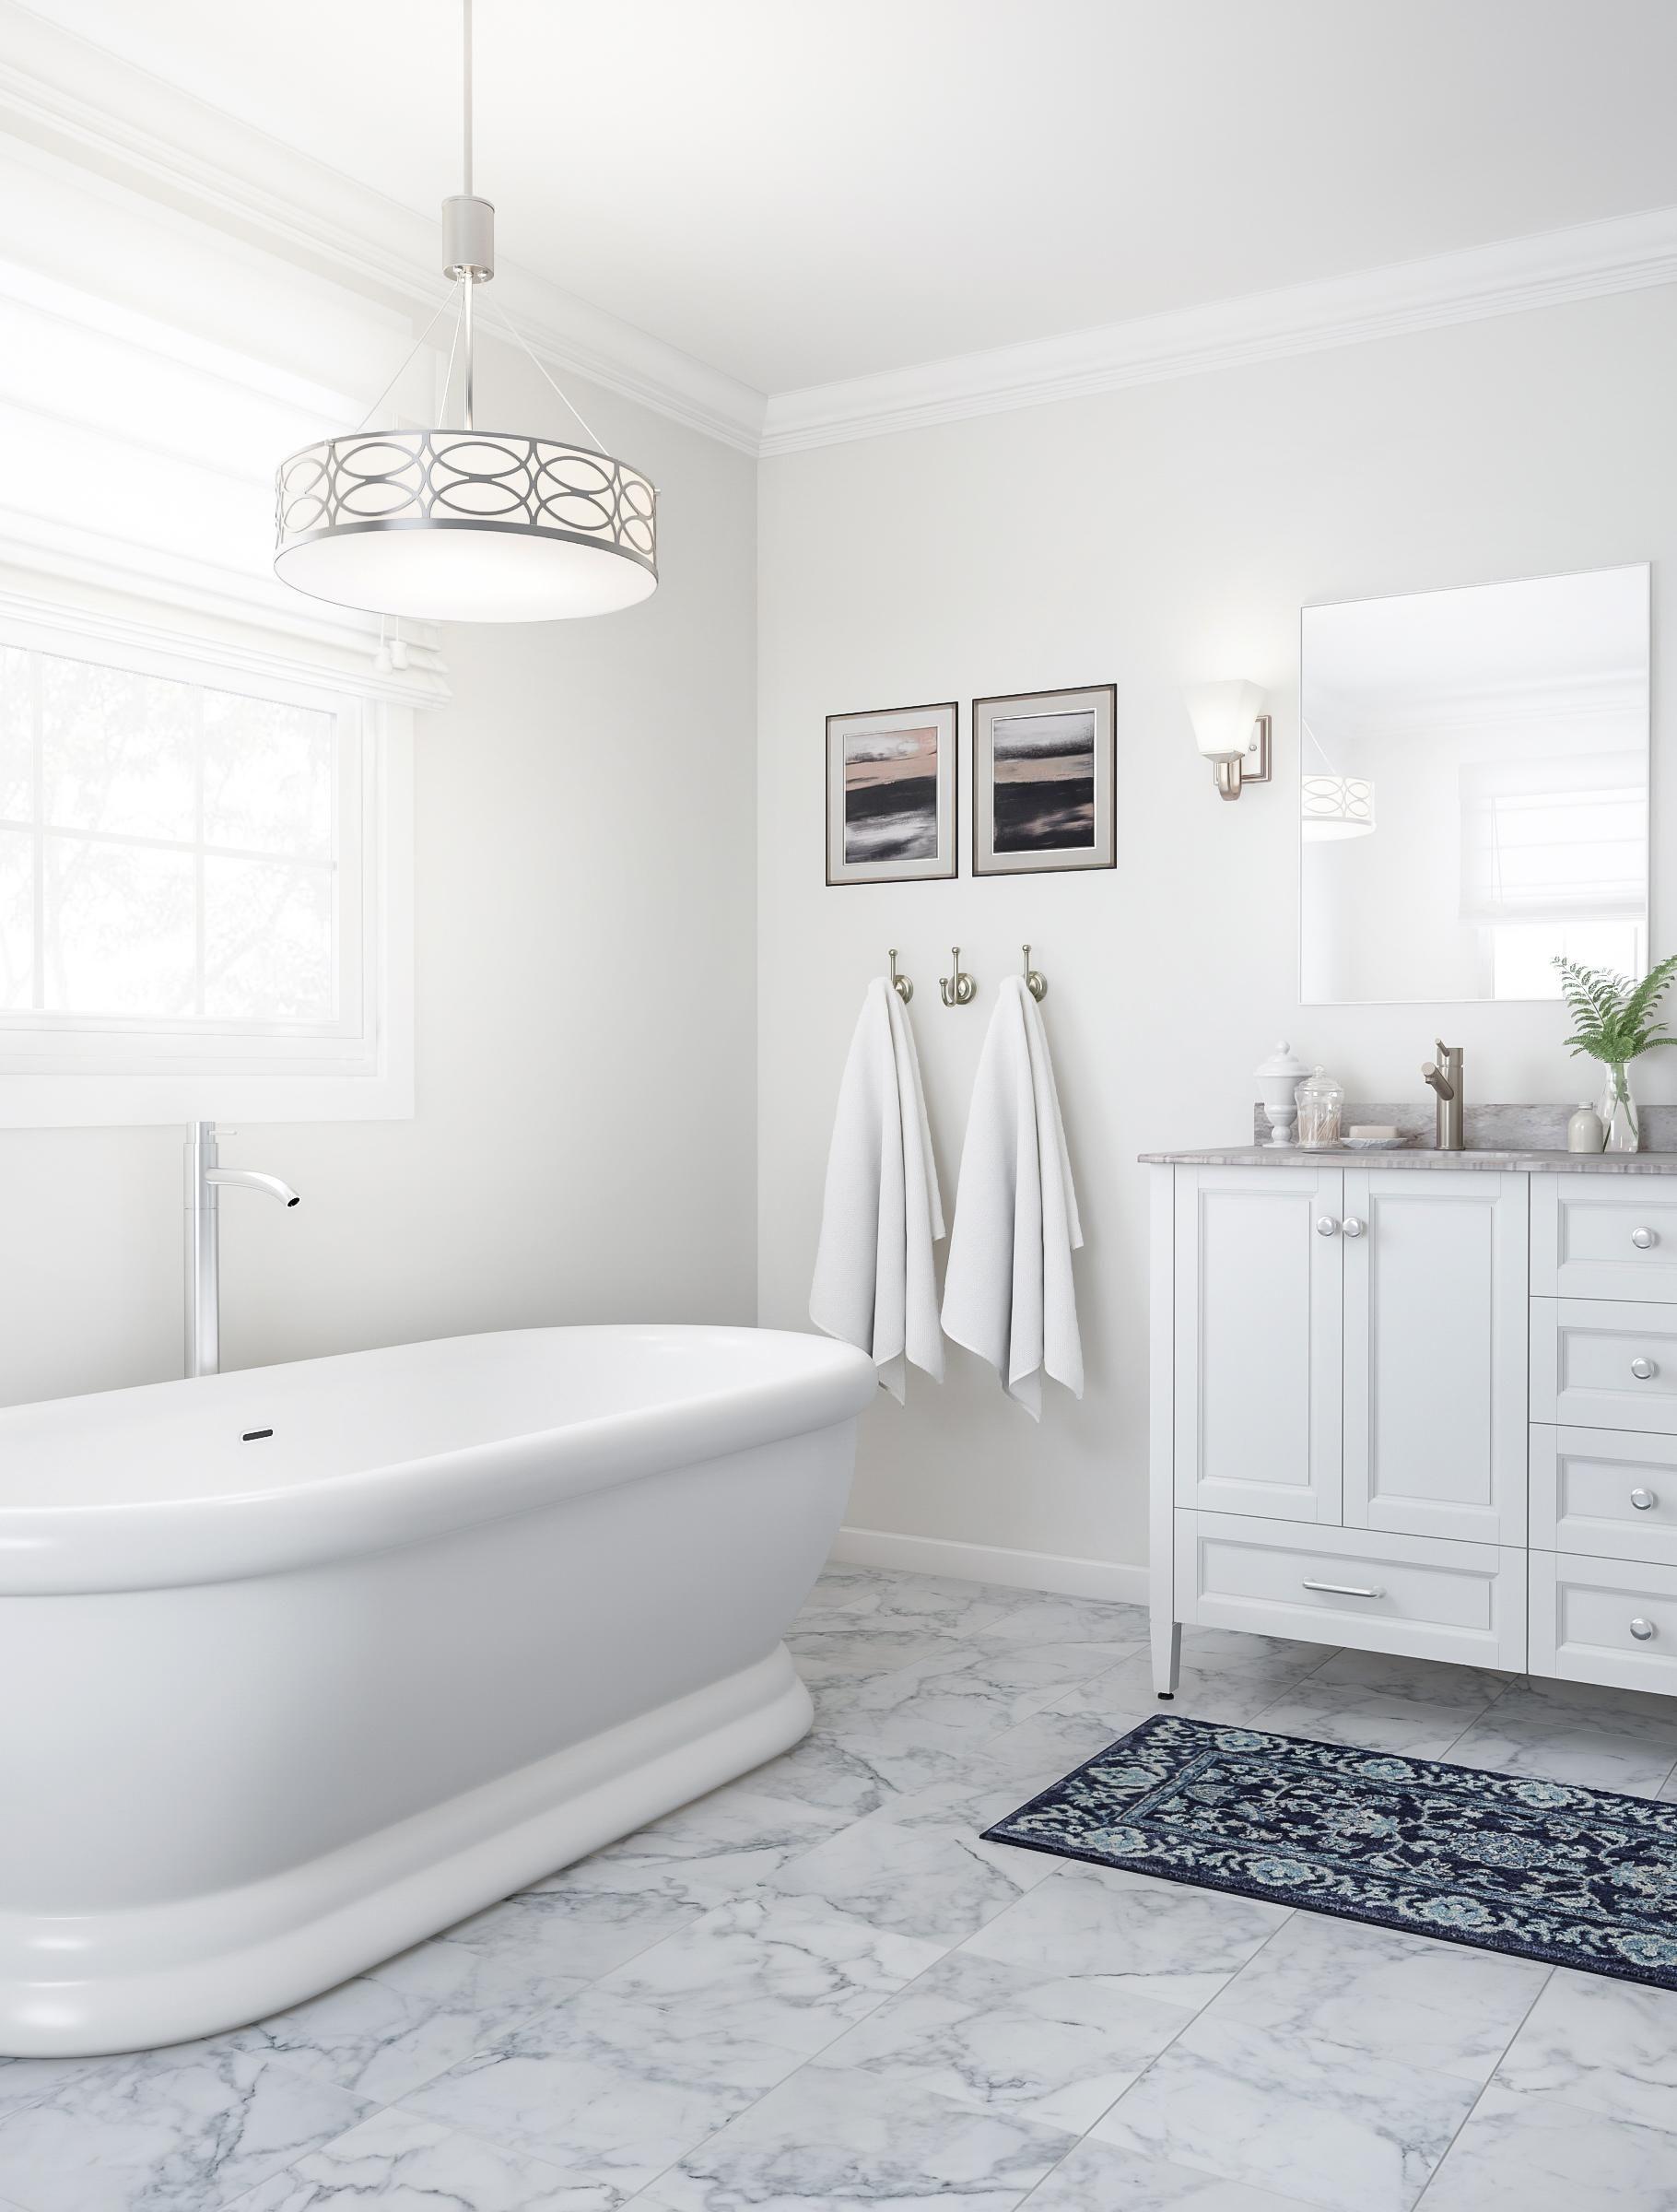 Classic White Bathroom With Pedestal Tub Shower Remodel Bathrooms Remodel Trendy Bathroom